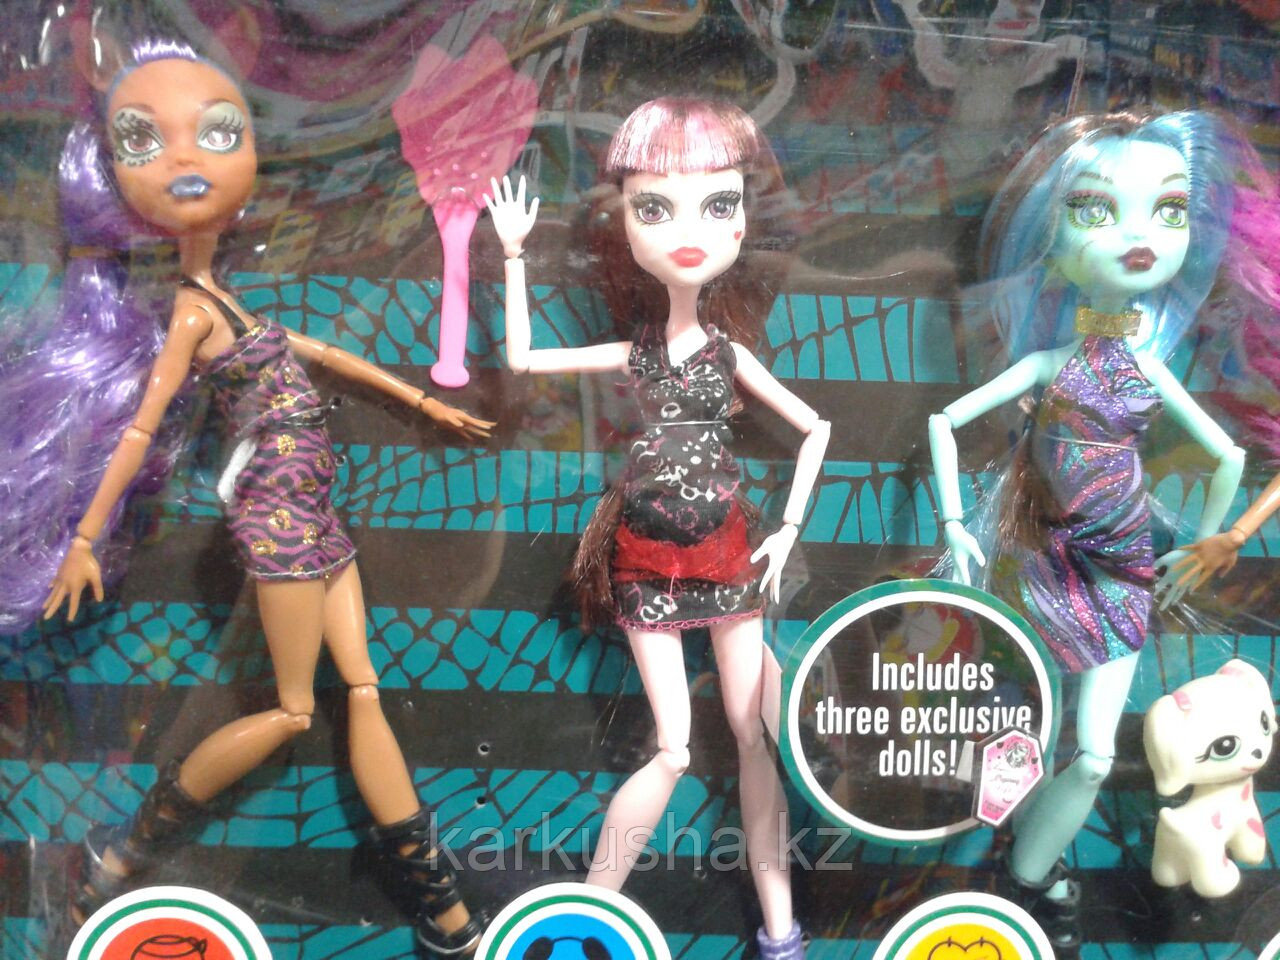 My Monster набор кукол(5шт), аналог Monster High